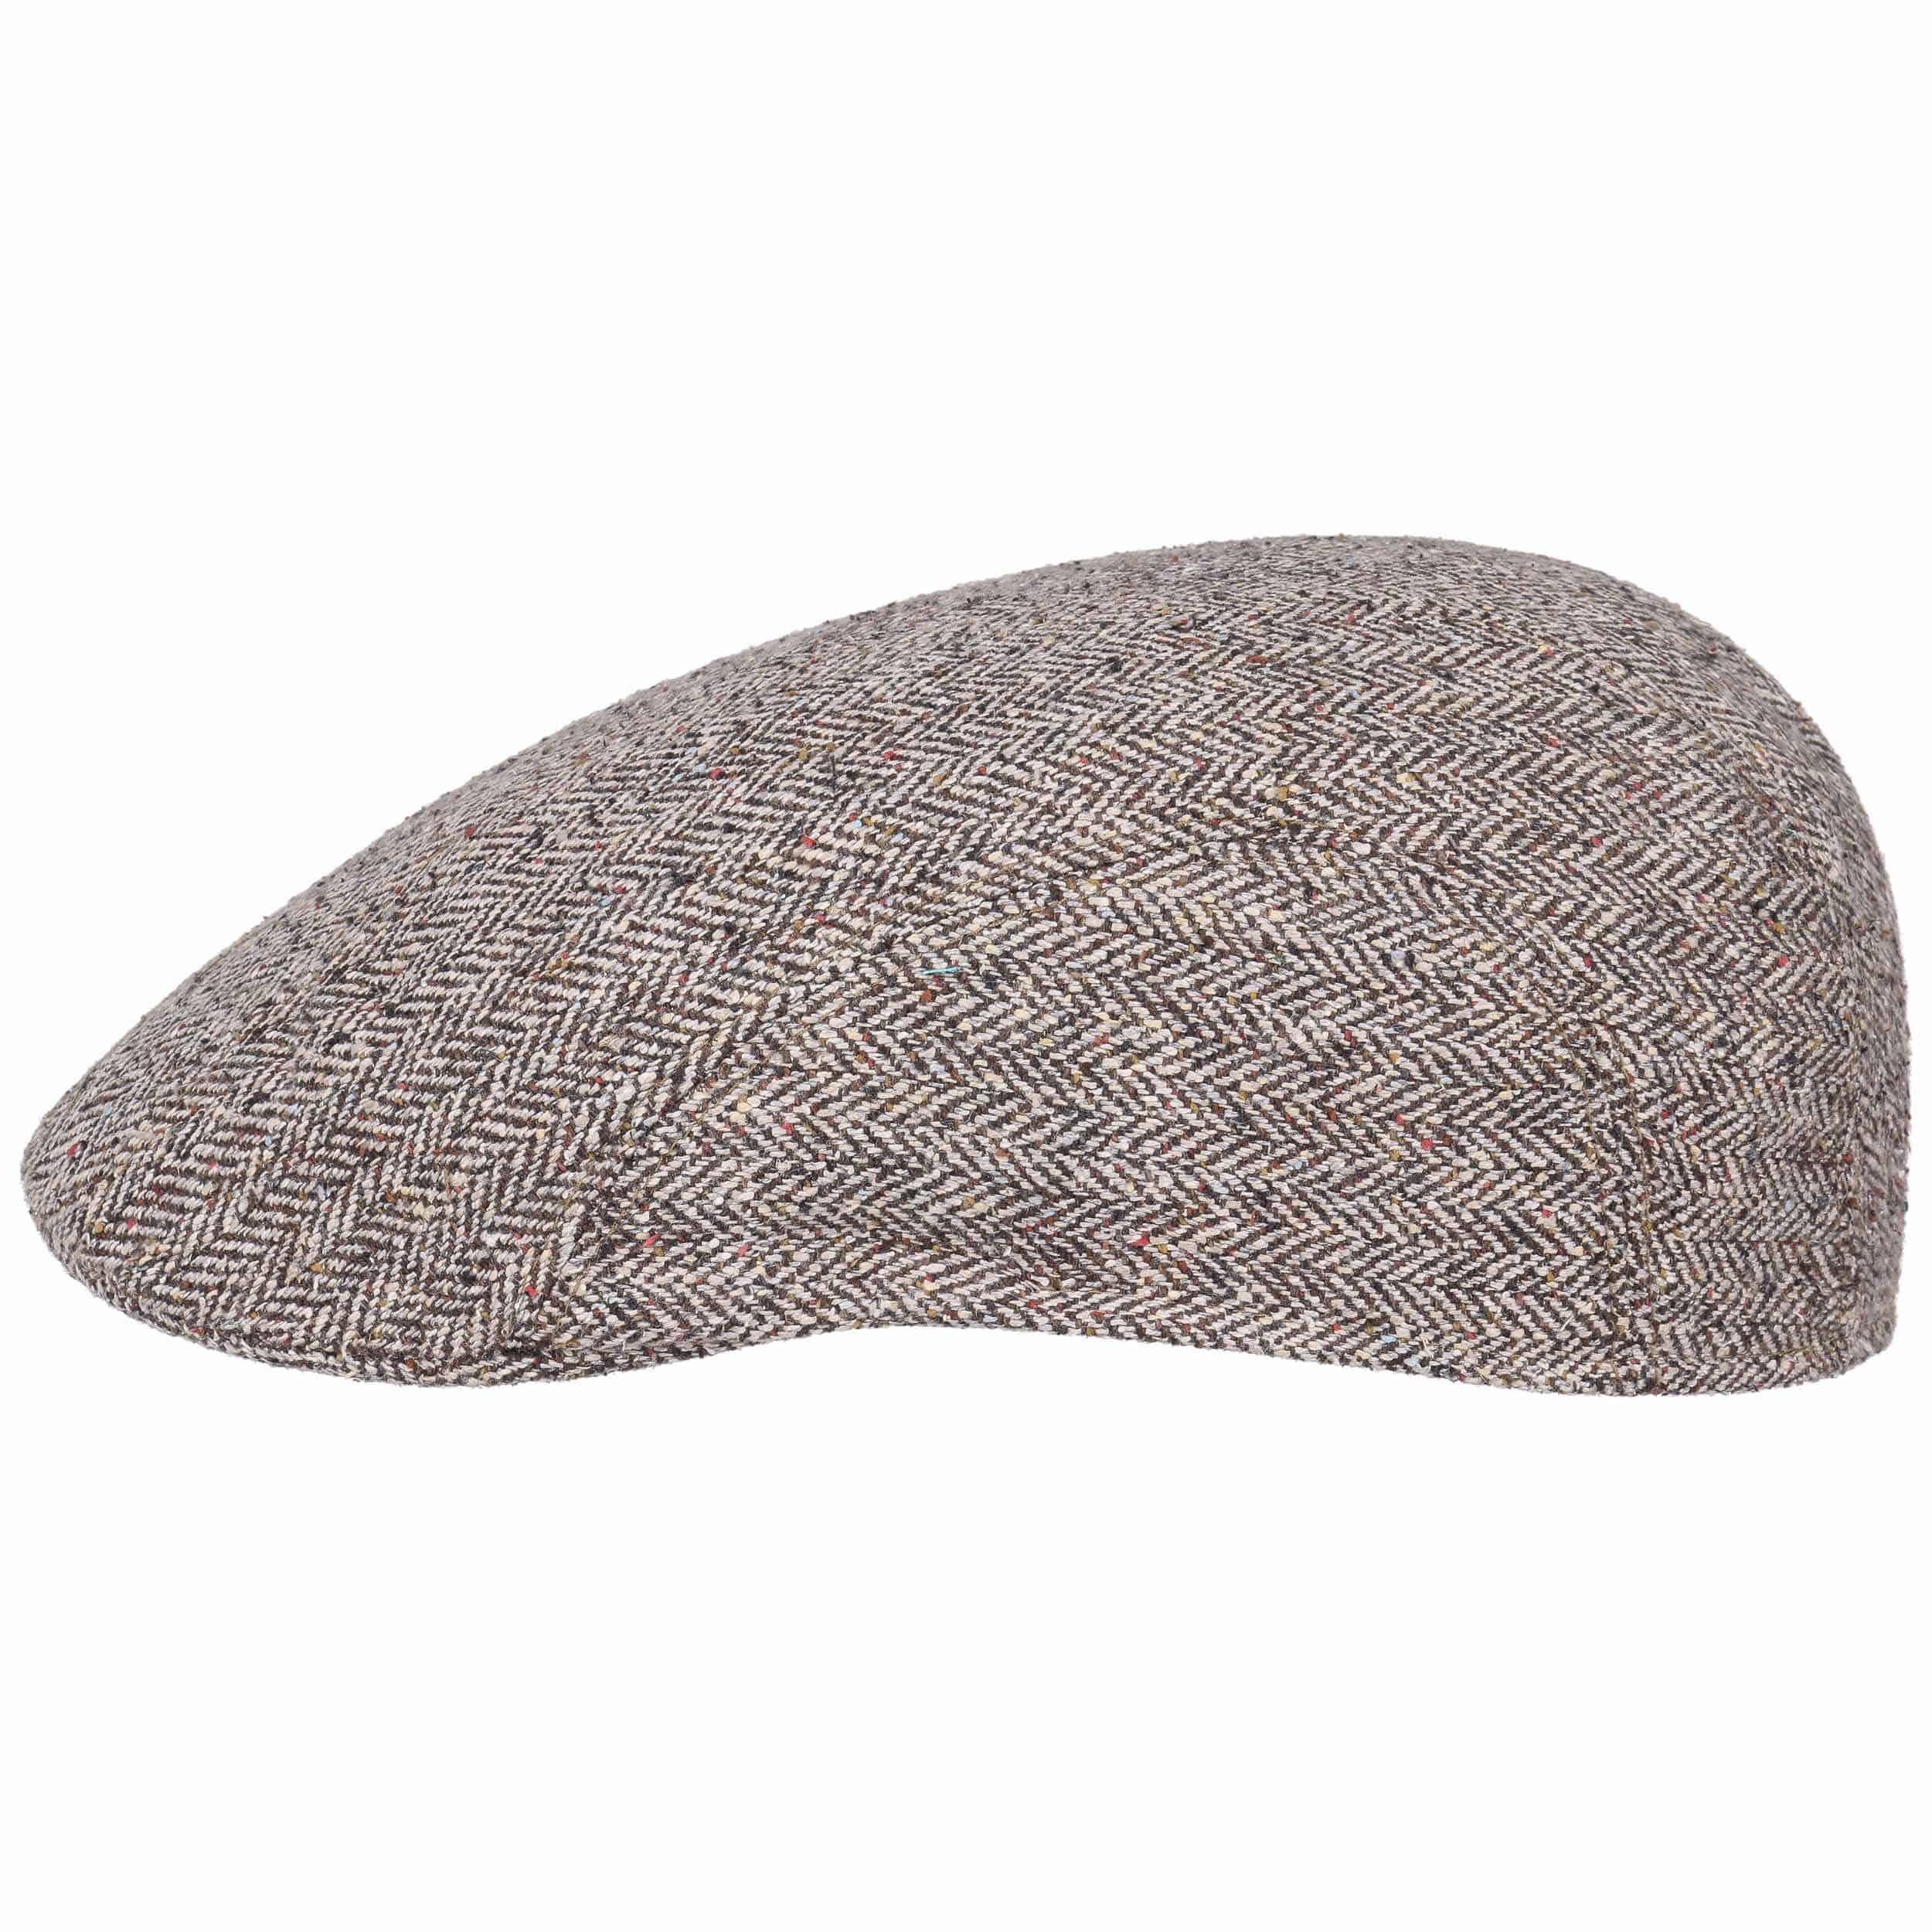 Gorra Gatsby de Seda Madison by Stetson - Gorras - sombreroshop.es 750e63dc567